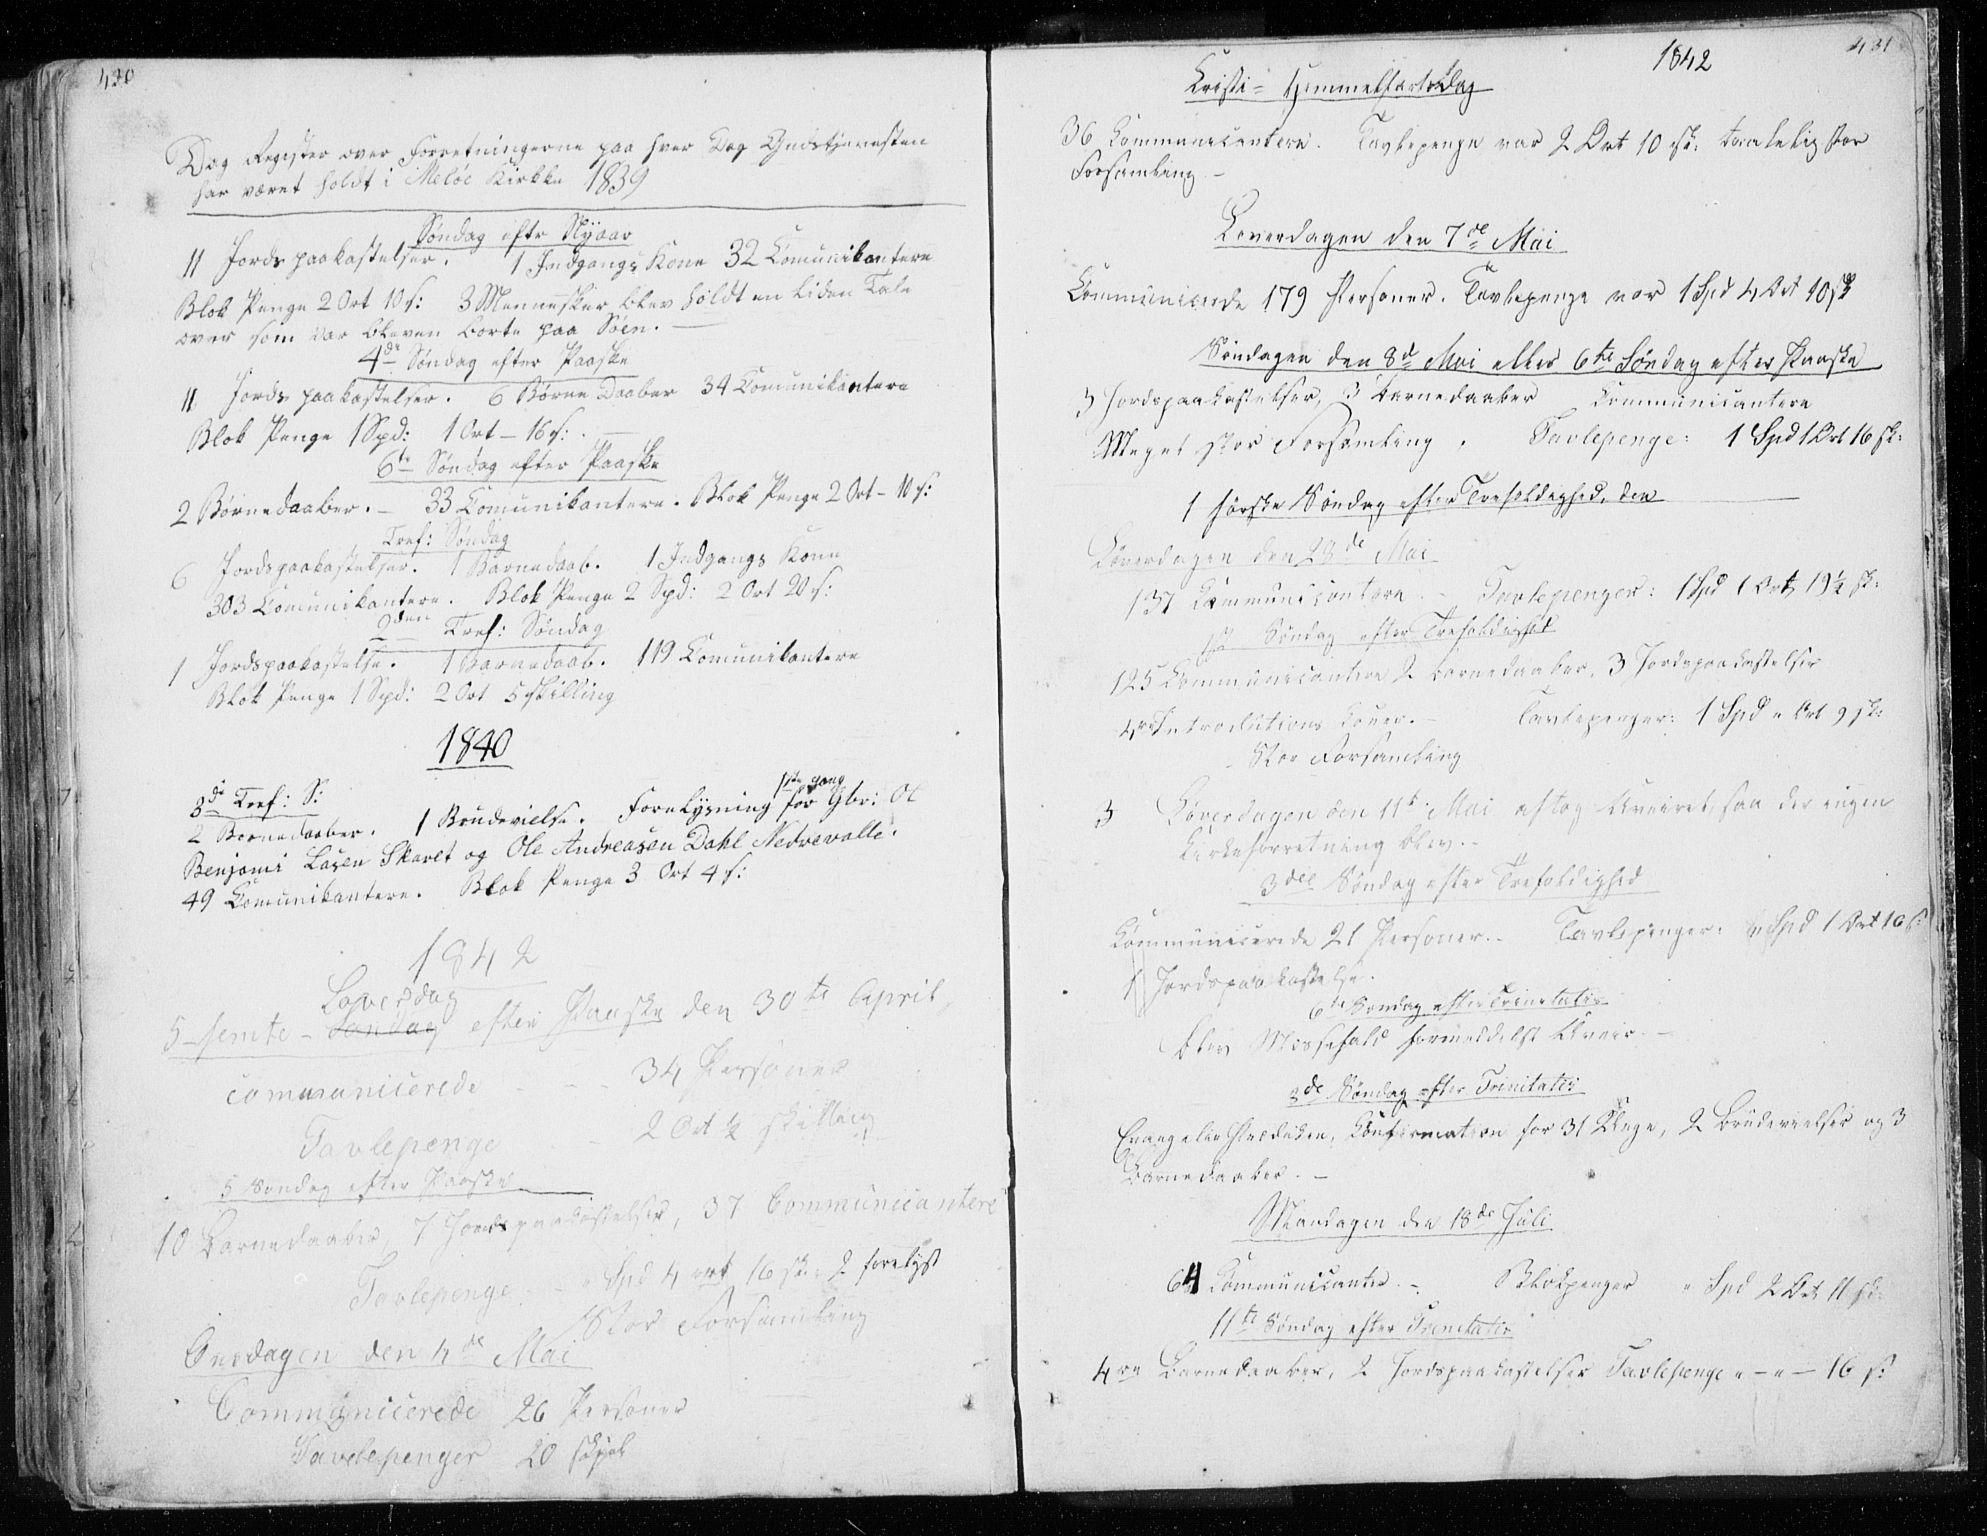 SAT, Ministerialprotokoller, klokkerbøker og fødselsregistre - Nordland, 843/L0632: Klokkerbok nr. 843C01, 1833-1853, s. 430-431